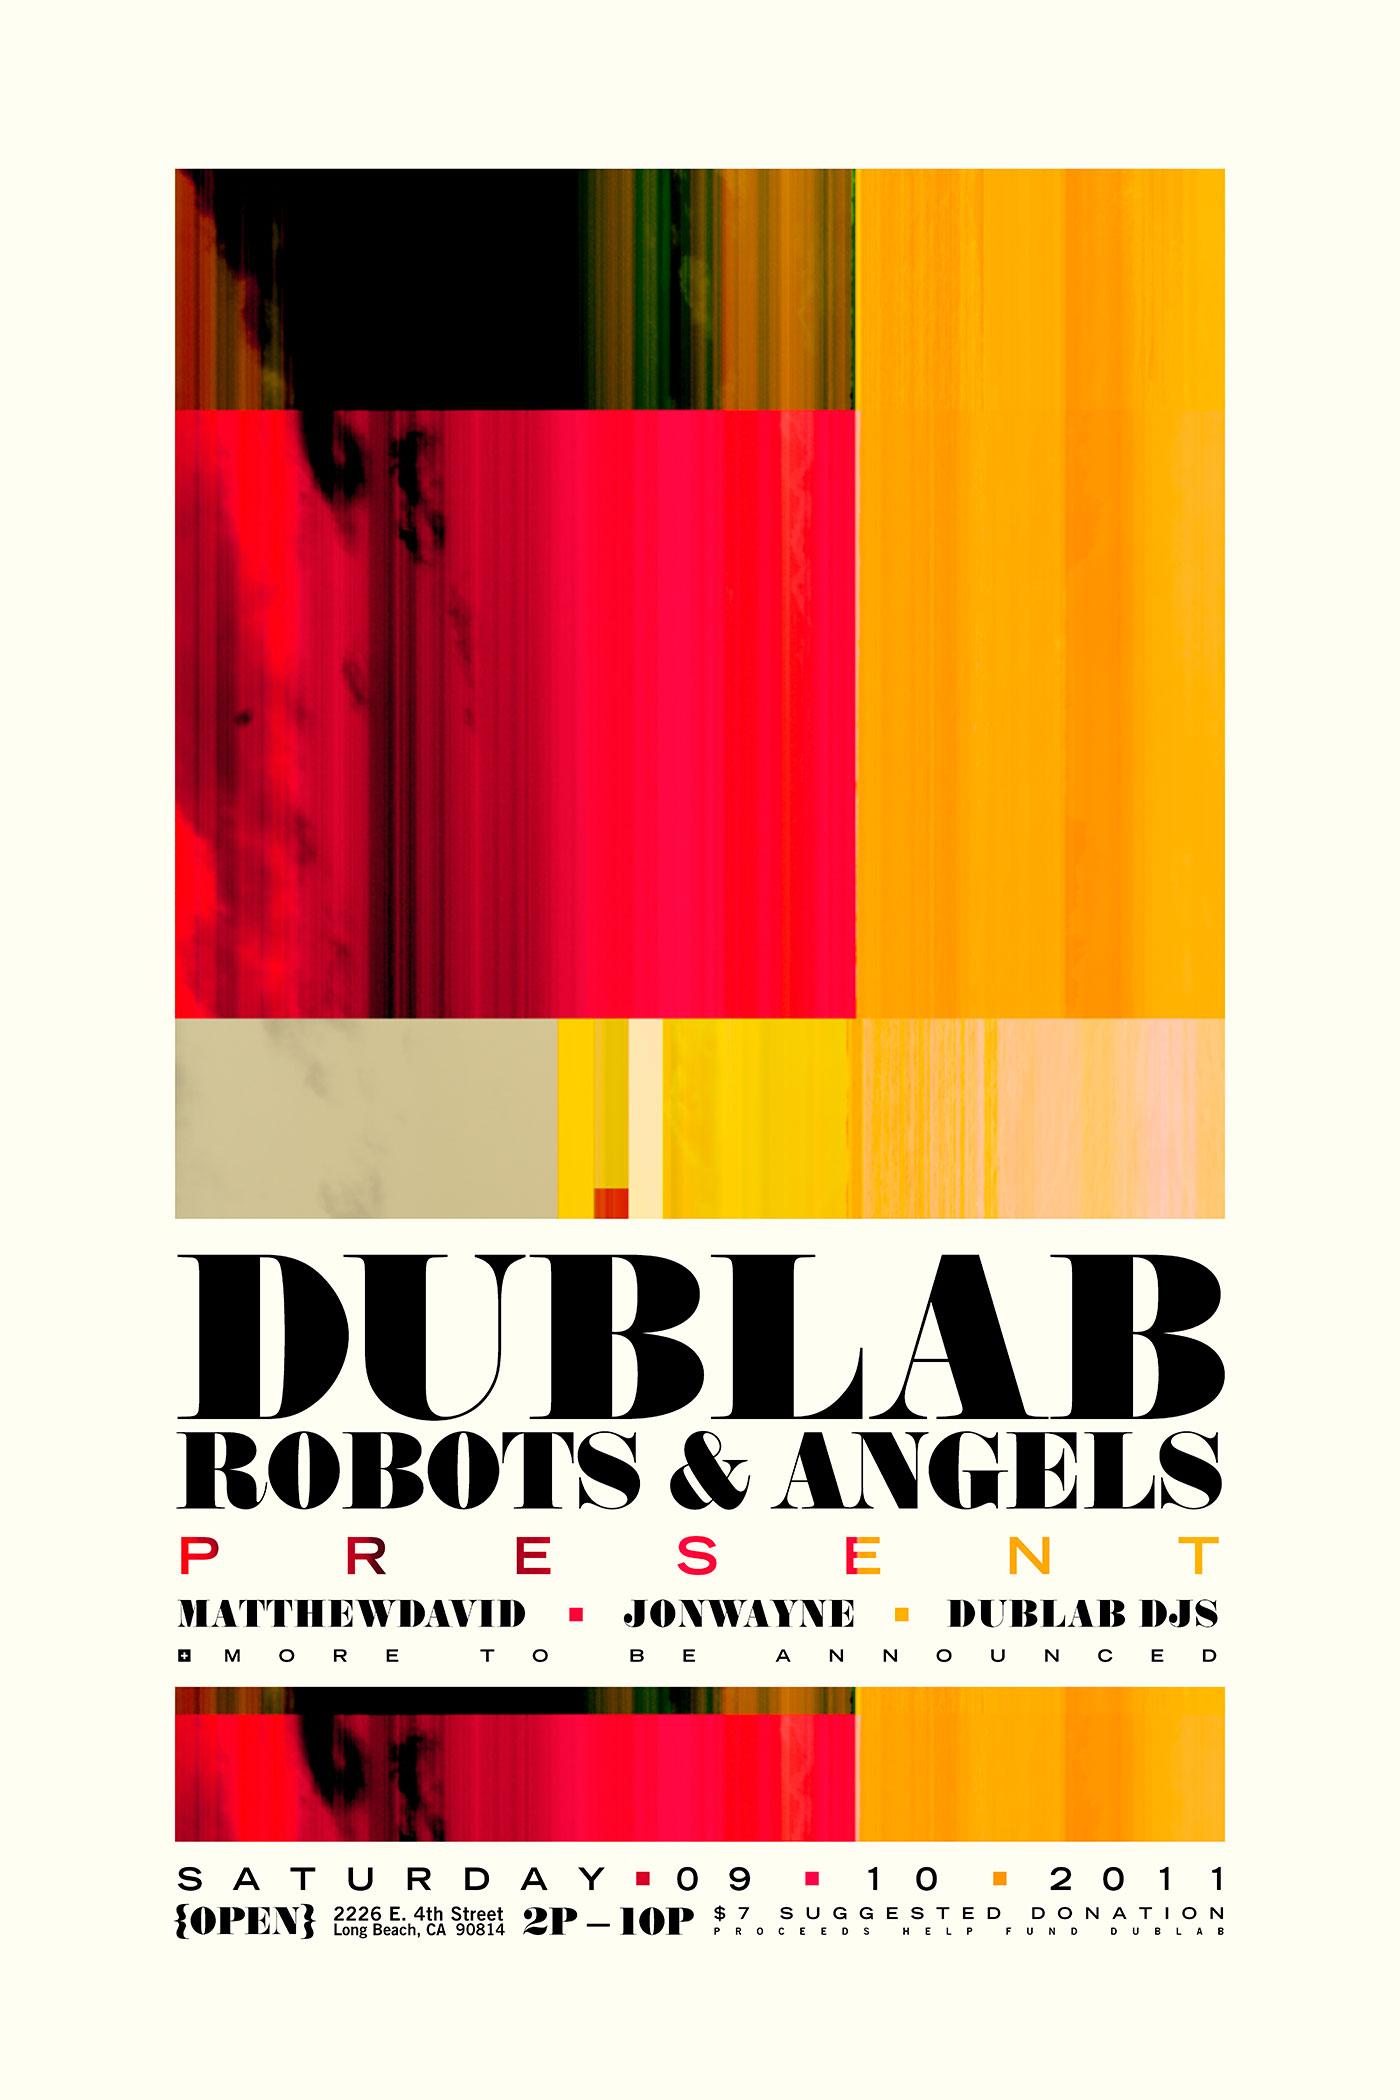 dblb_show_poster_v1_r2_12x18.jpg